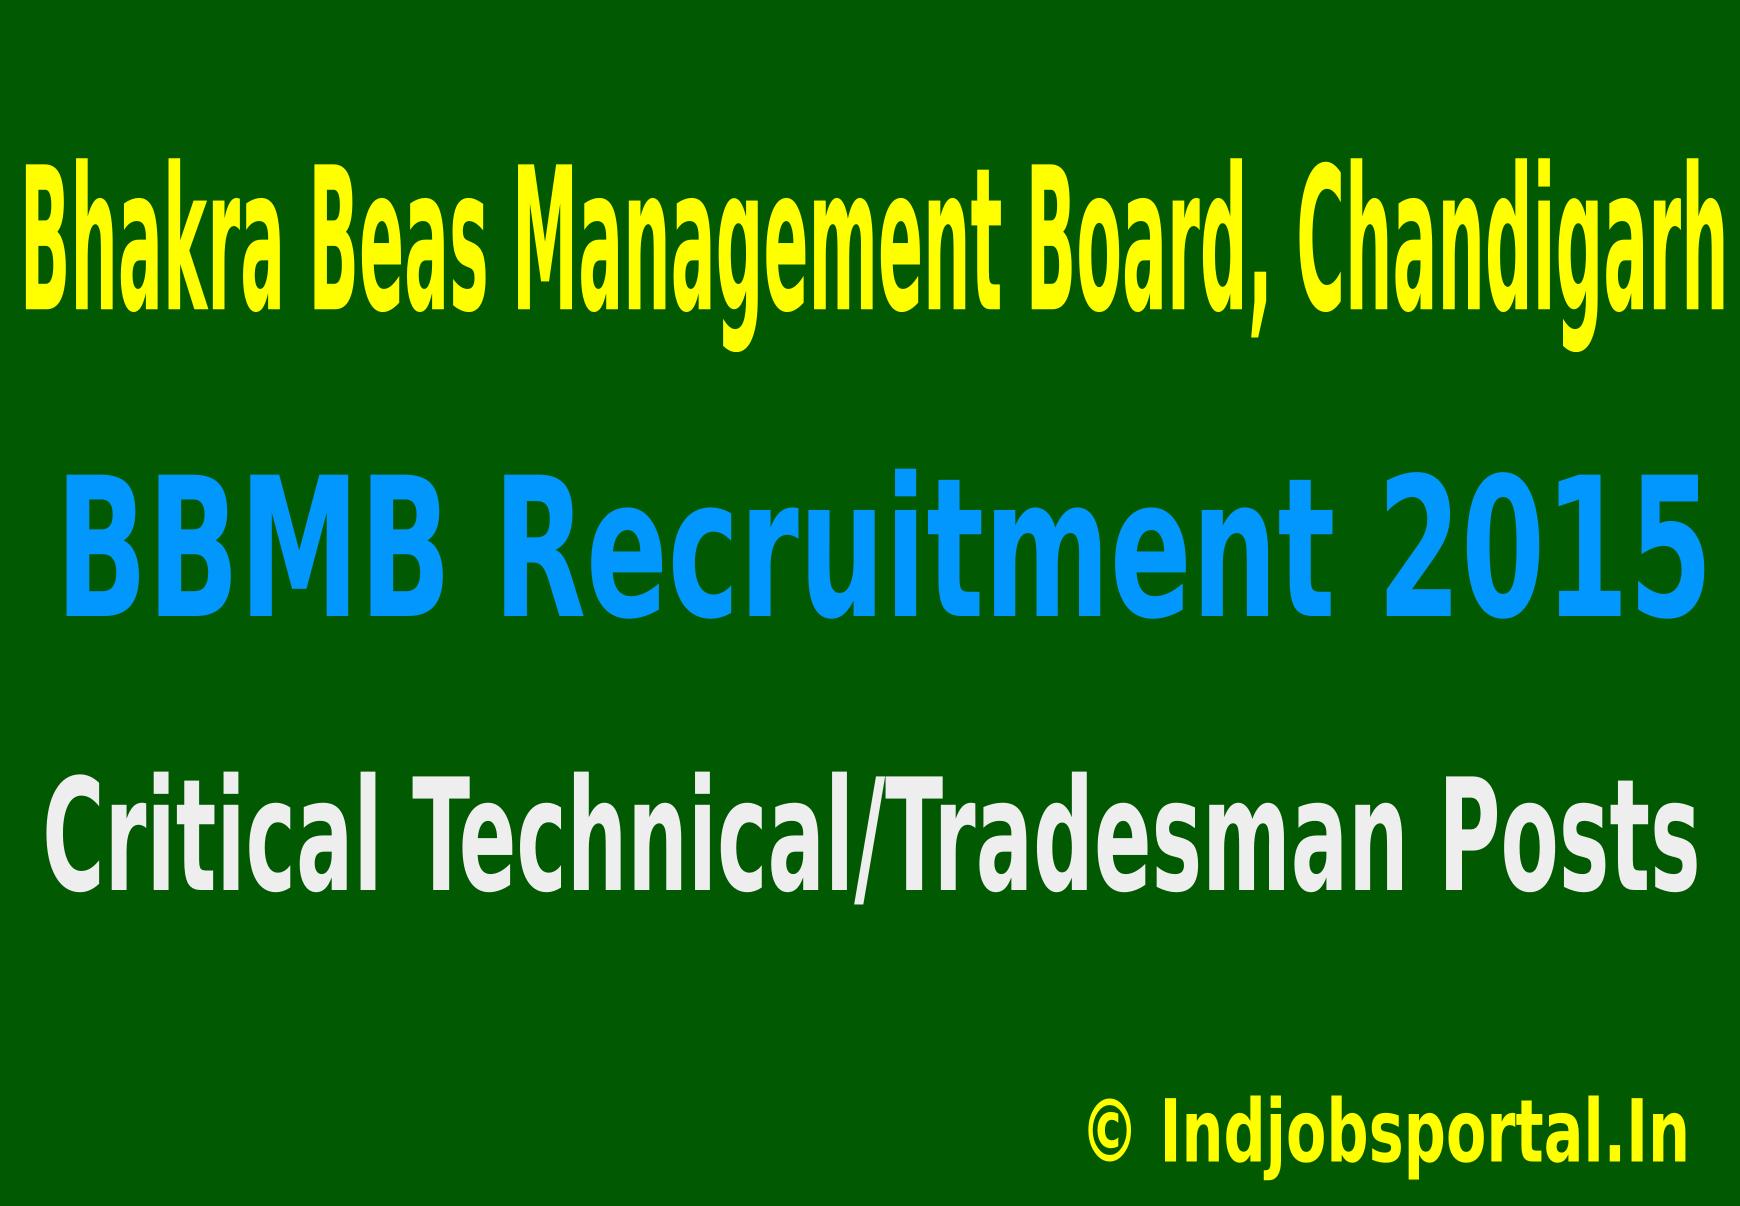 BBMB Recruitment 2015 Online Application For 267 Critical Technical/Tradesman Posts